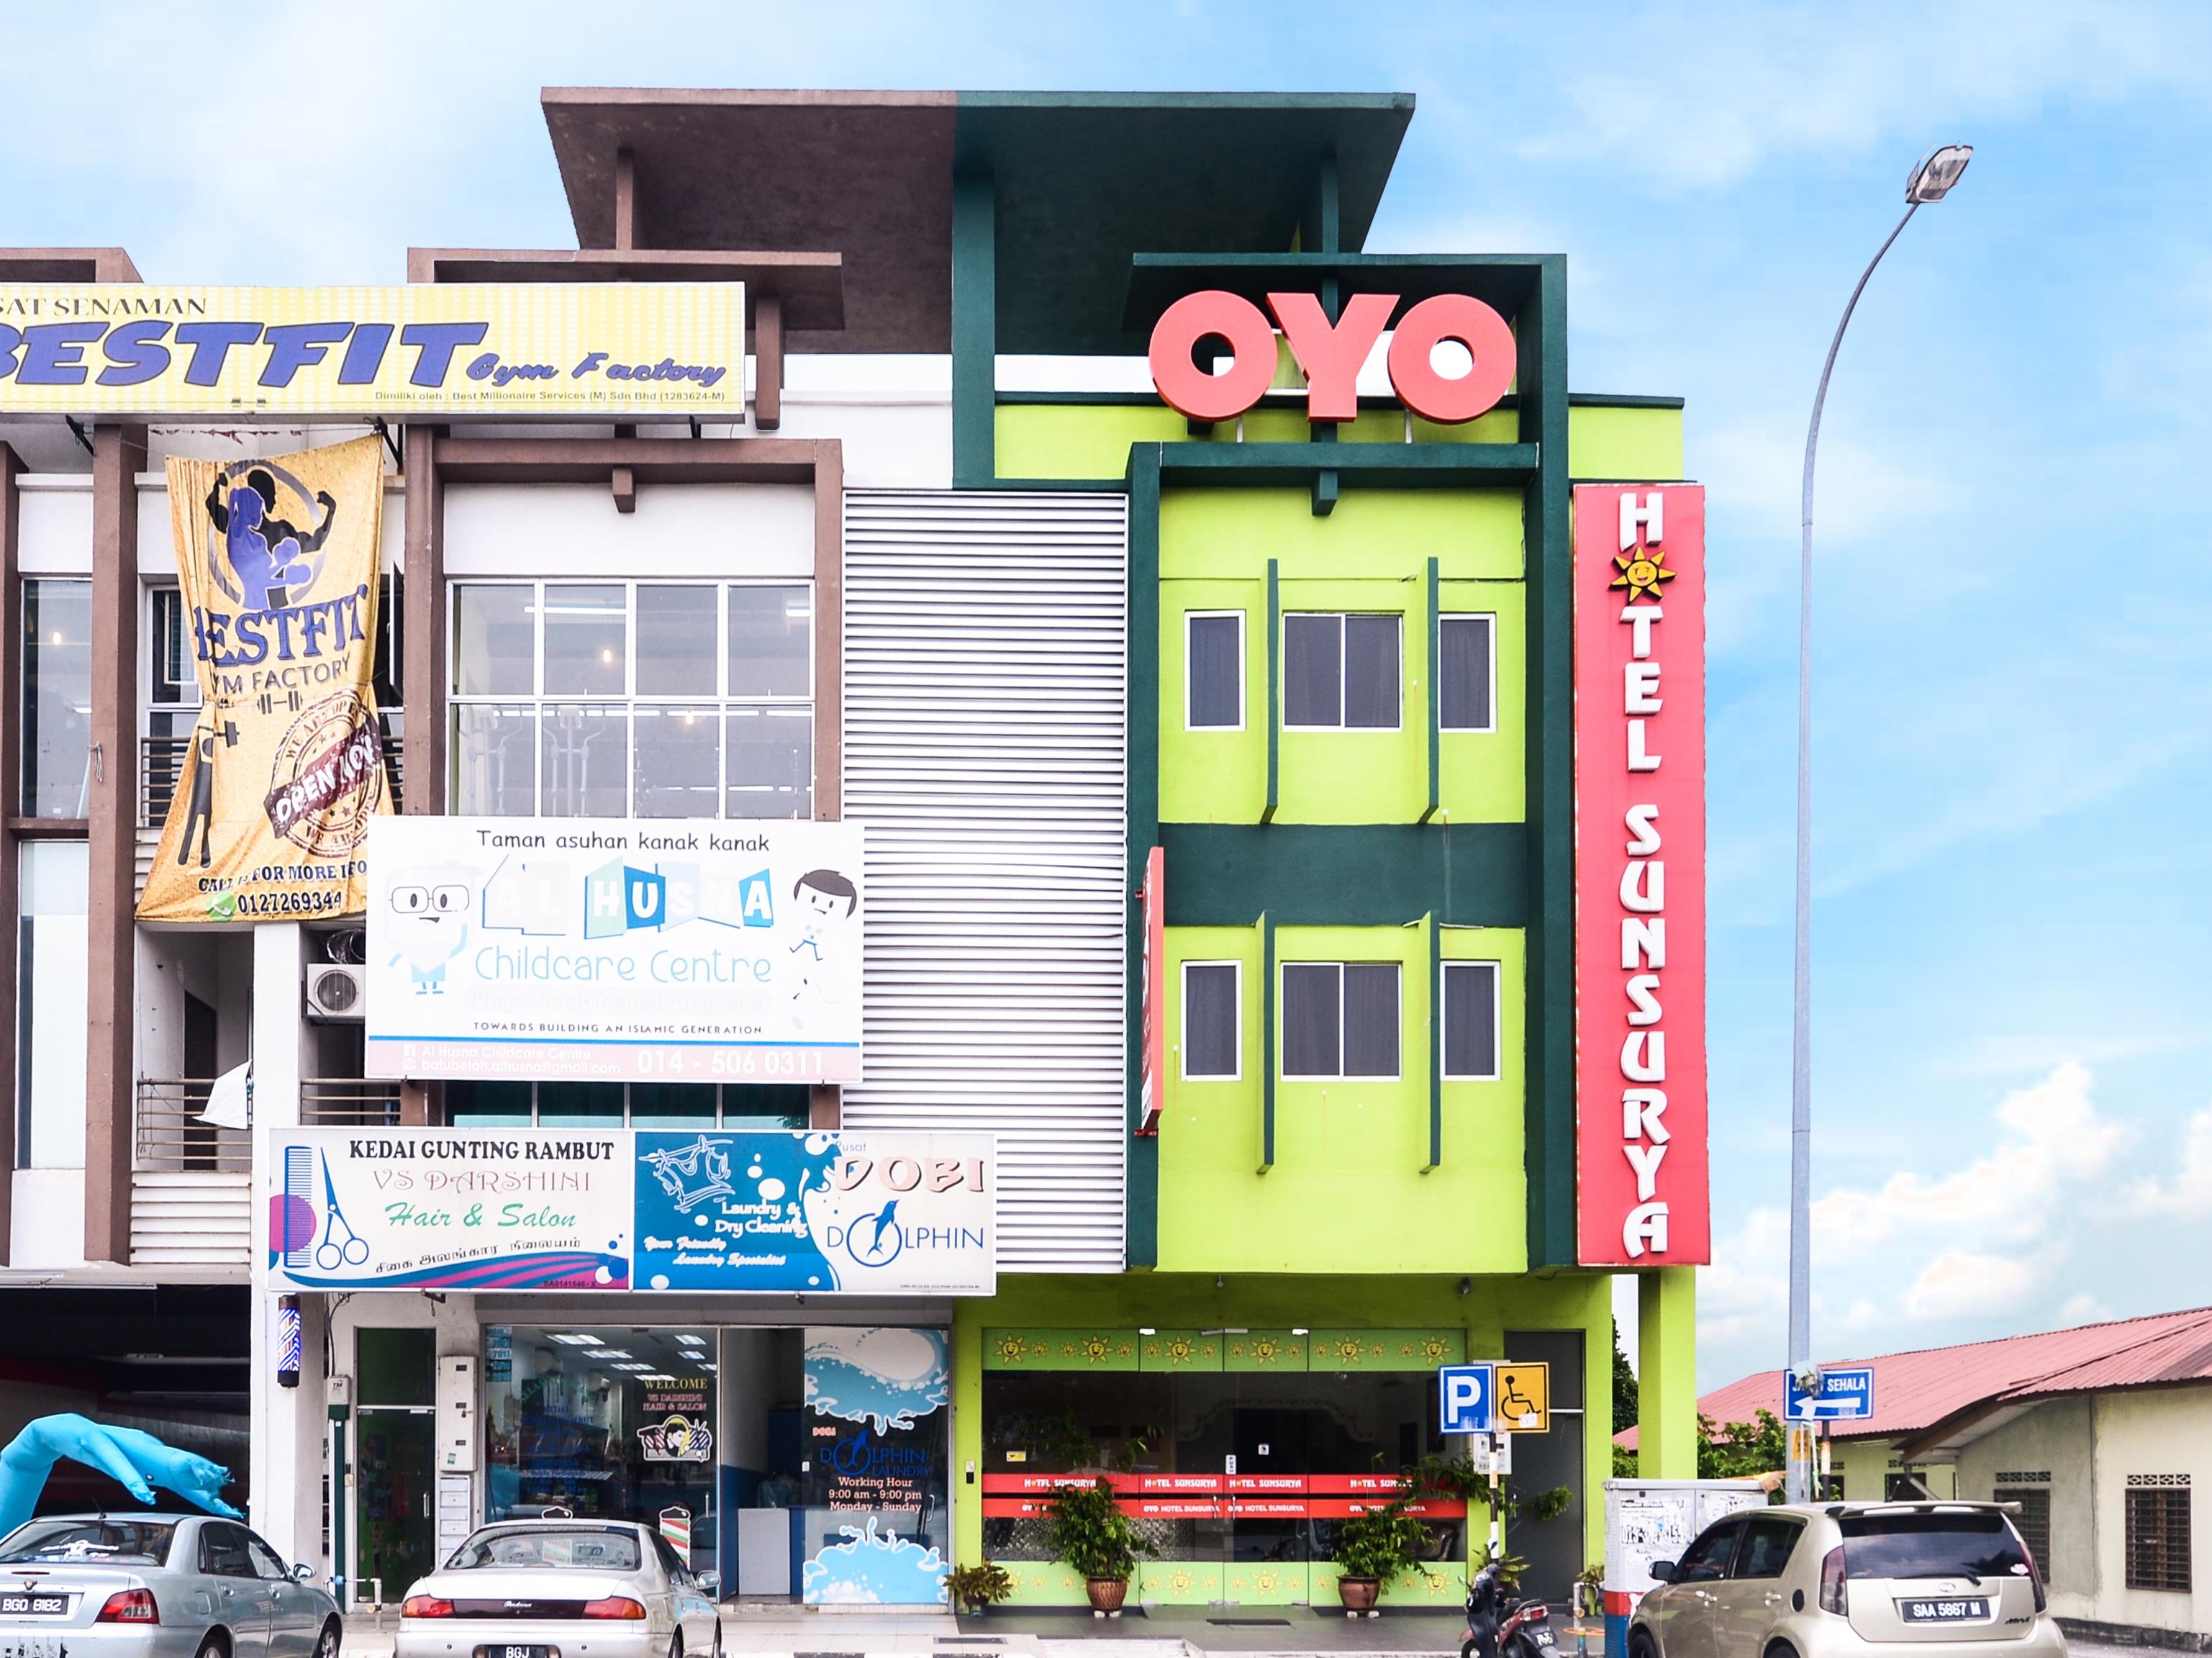 OYO 1019 Hotel Sunsurya, Klang